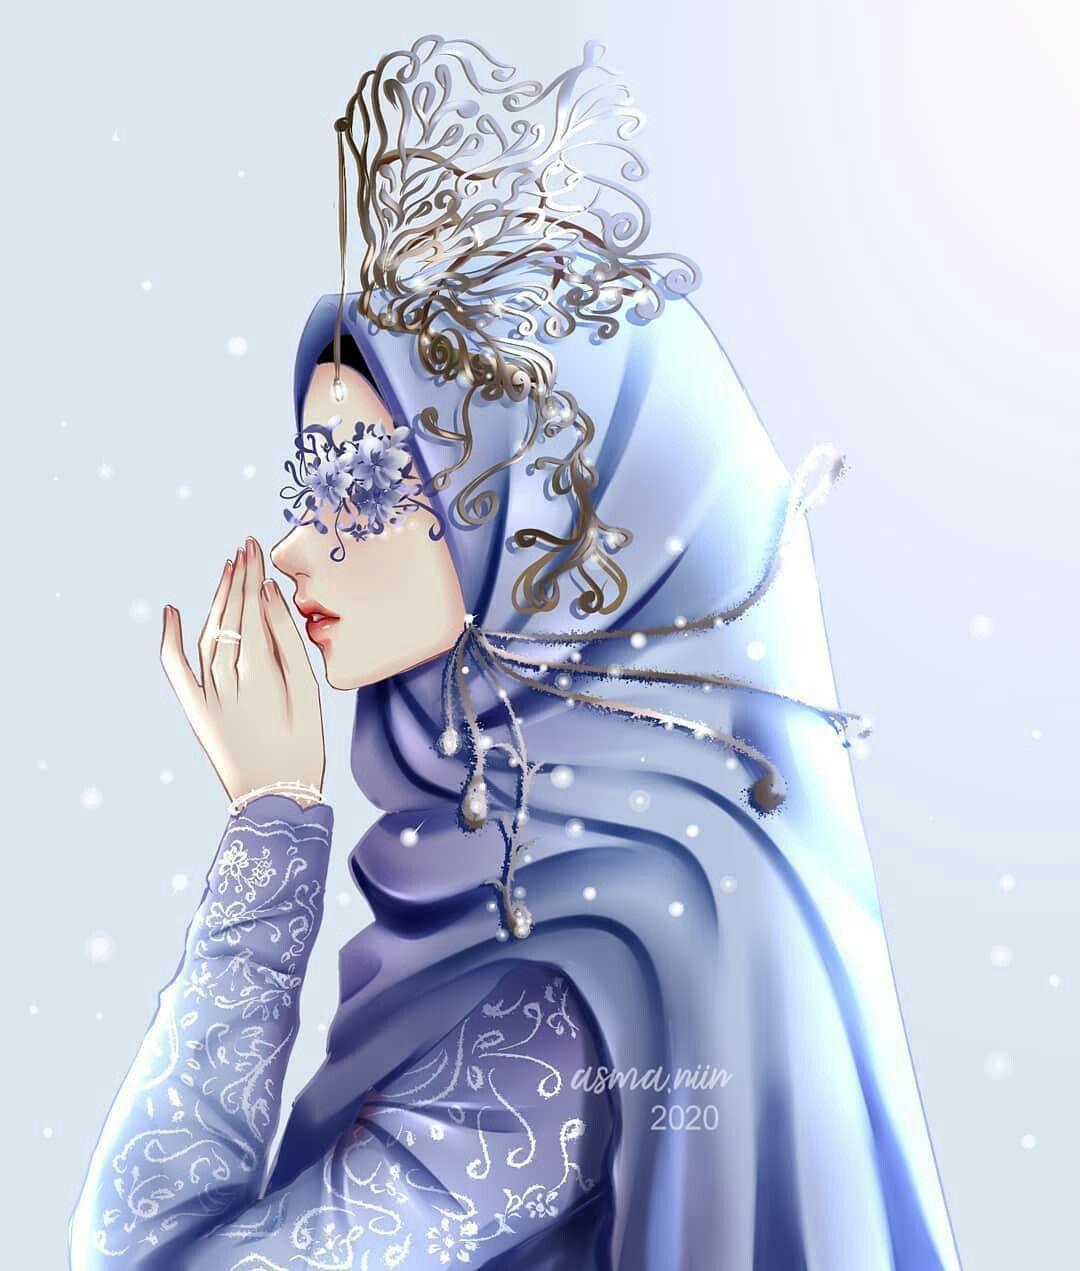 Pin Oleh Karla T Di Art S By Ig Asma Niin Di 2020 Ilustrasi Karakter Lukisan Wajah Ilustrasi Manga